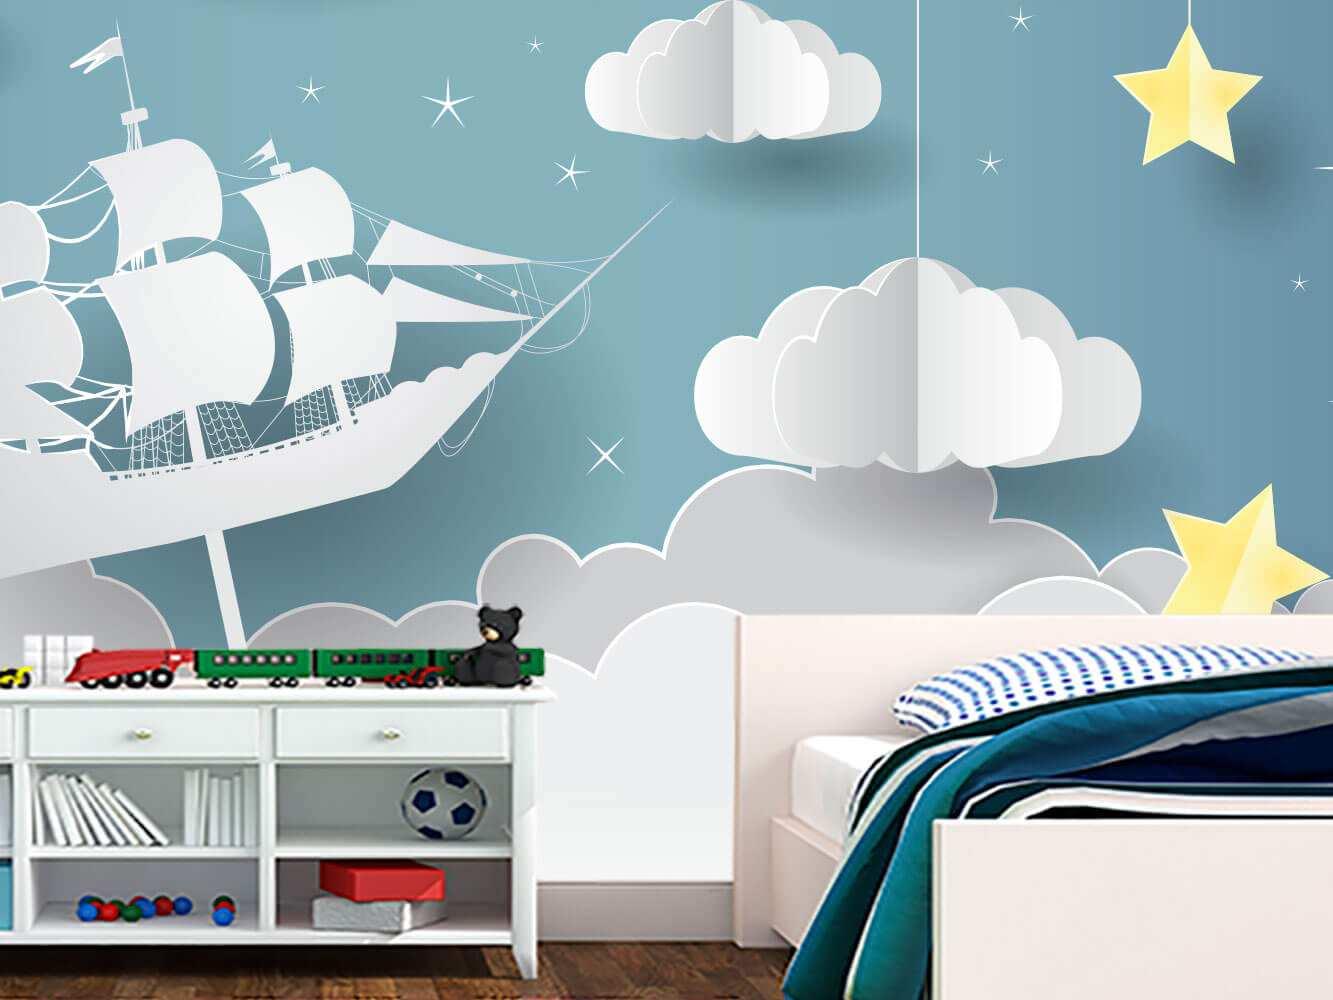 Fotomural Vinilo Infantil 3D Barco Nubes | Carteles XXL - Impresión carteleria publicitaria